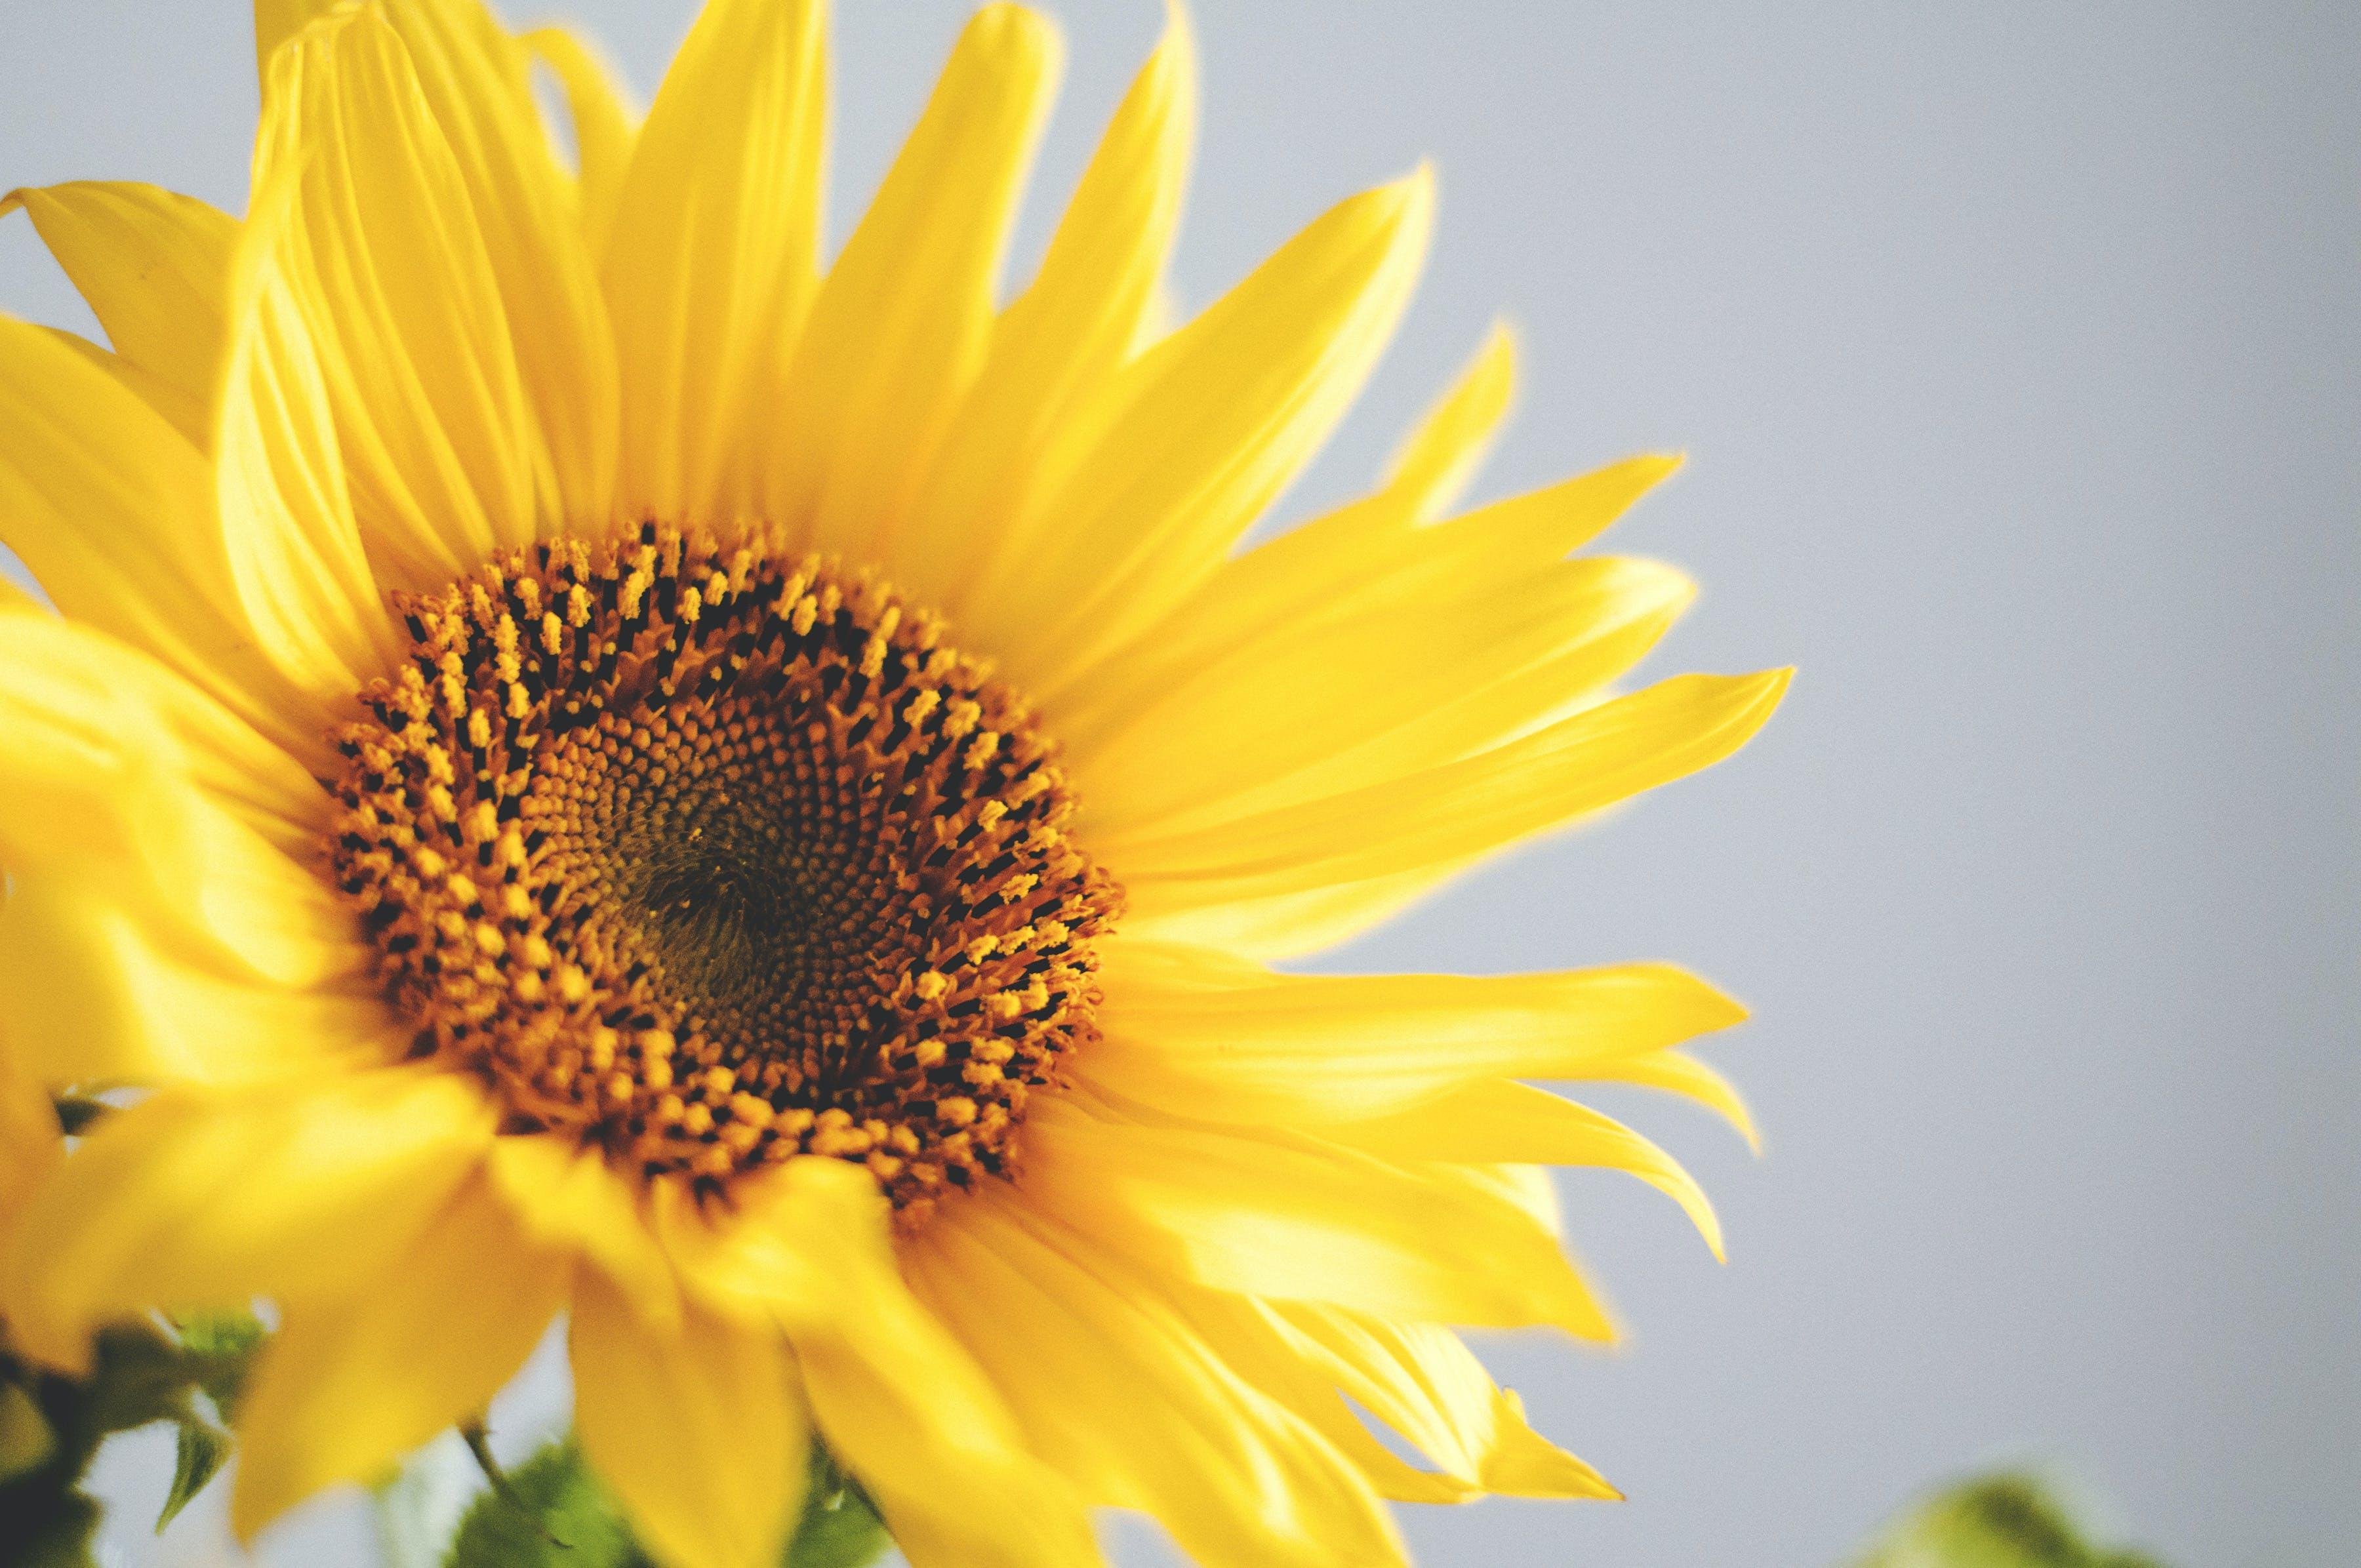 Shallow Focus Photo of Sunflower